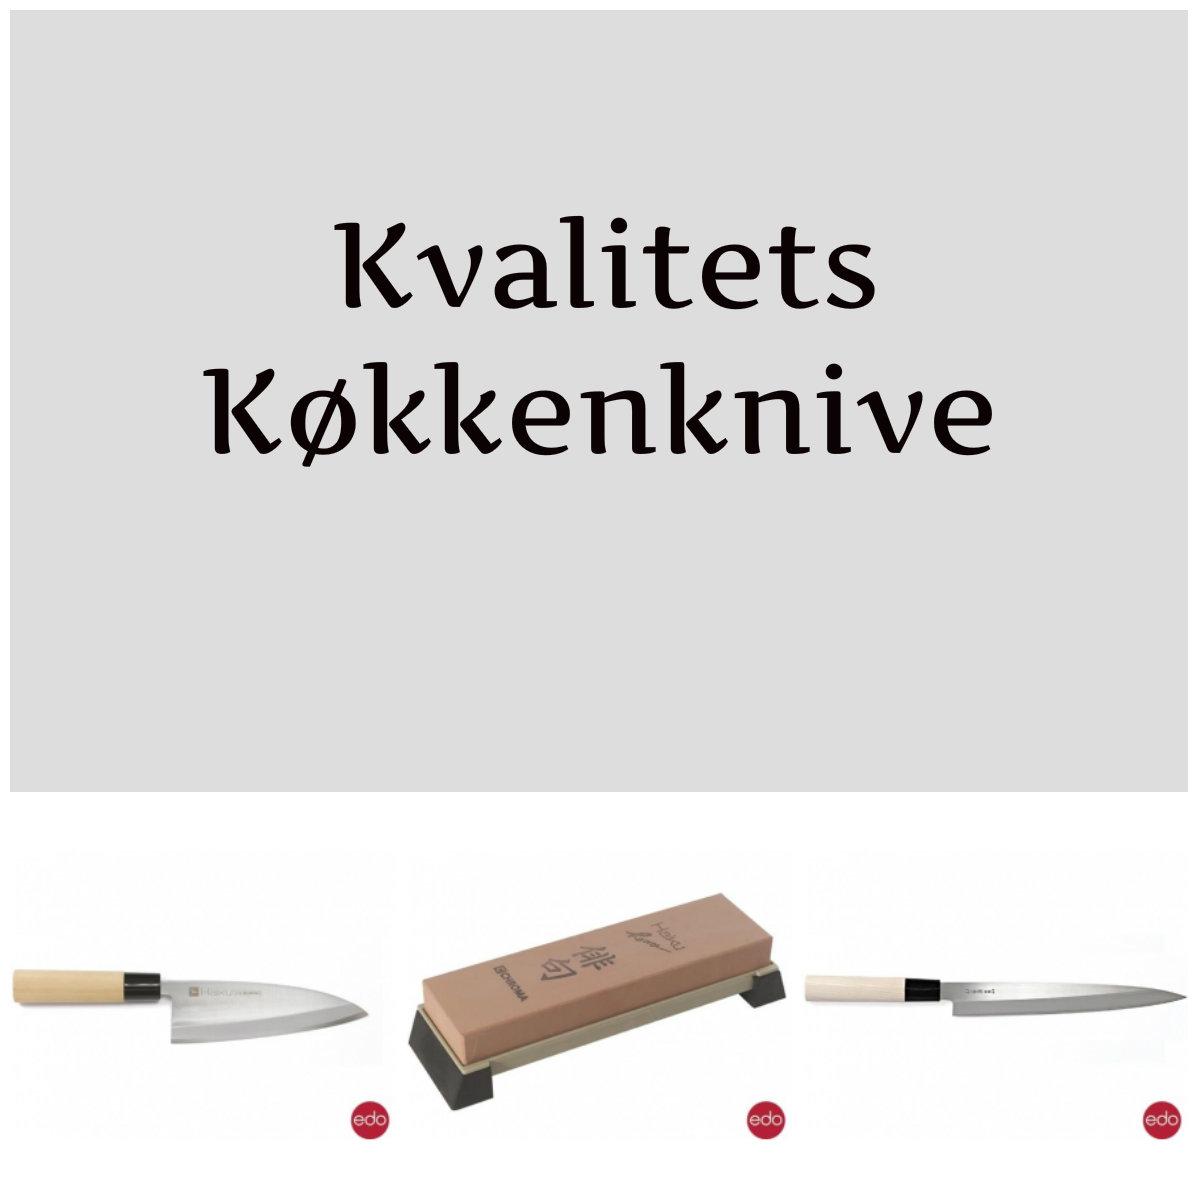 Kvalitets køkkenknive